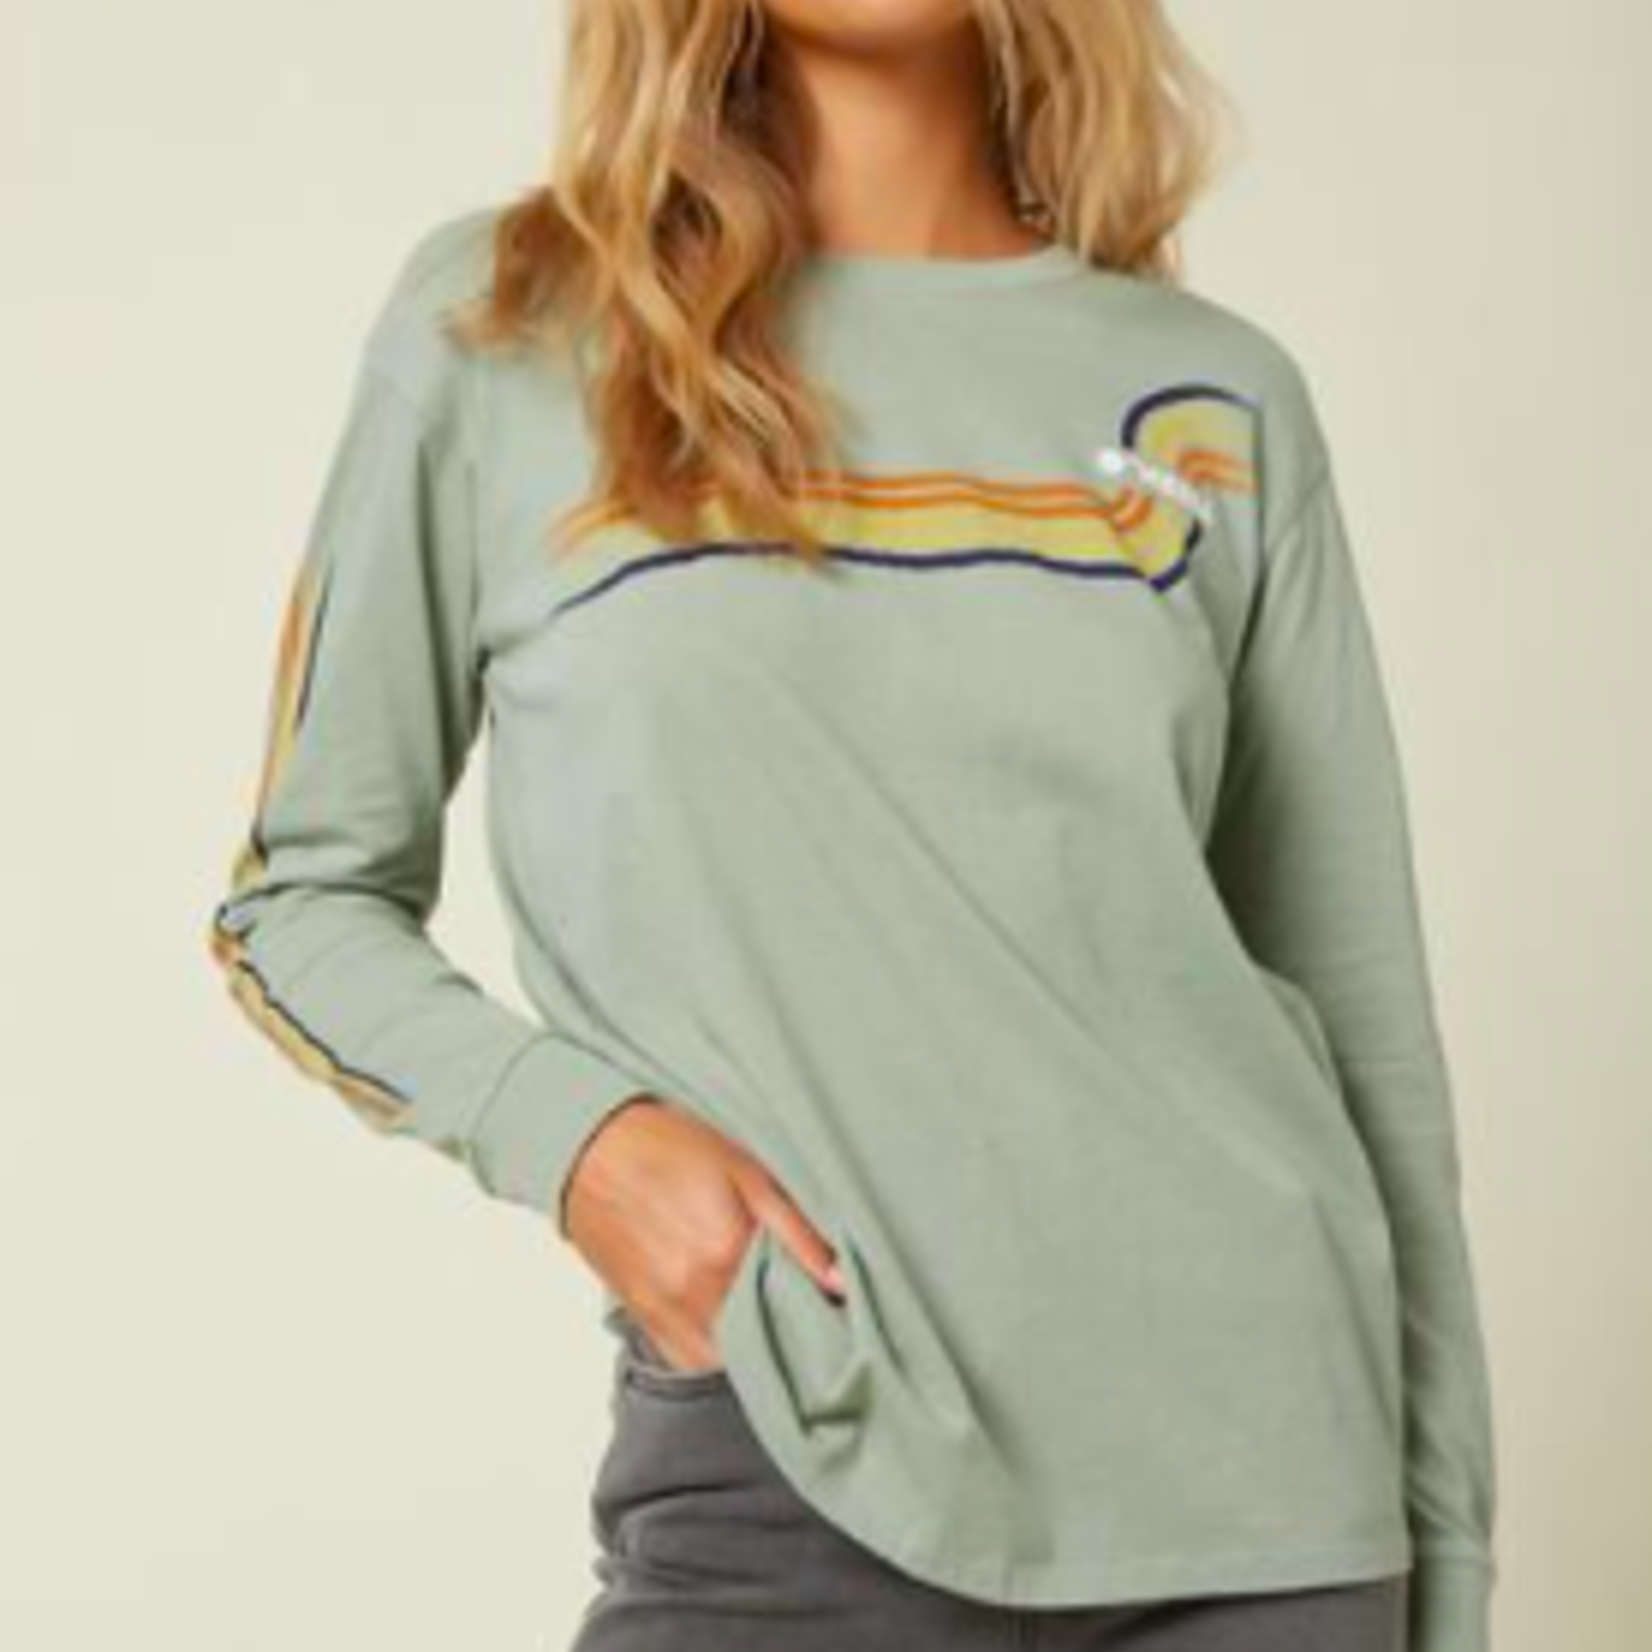 O'Neill O'neill Womens Bronzing Long Sleeved Logo T-shirt.